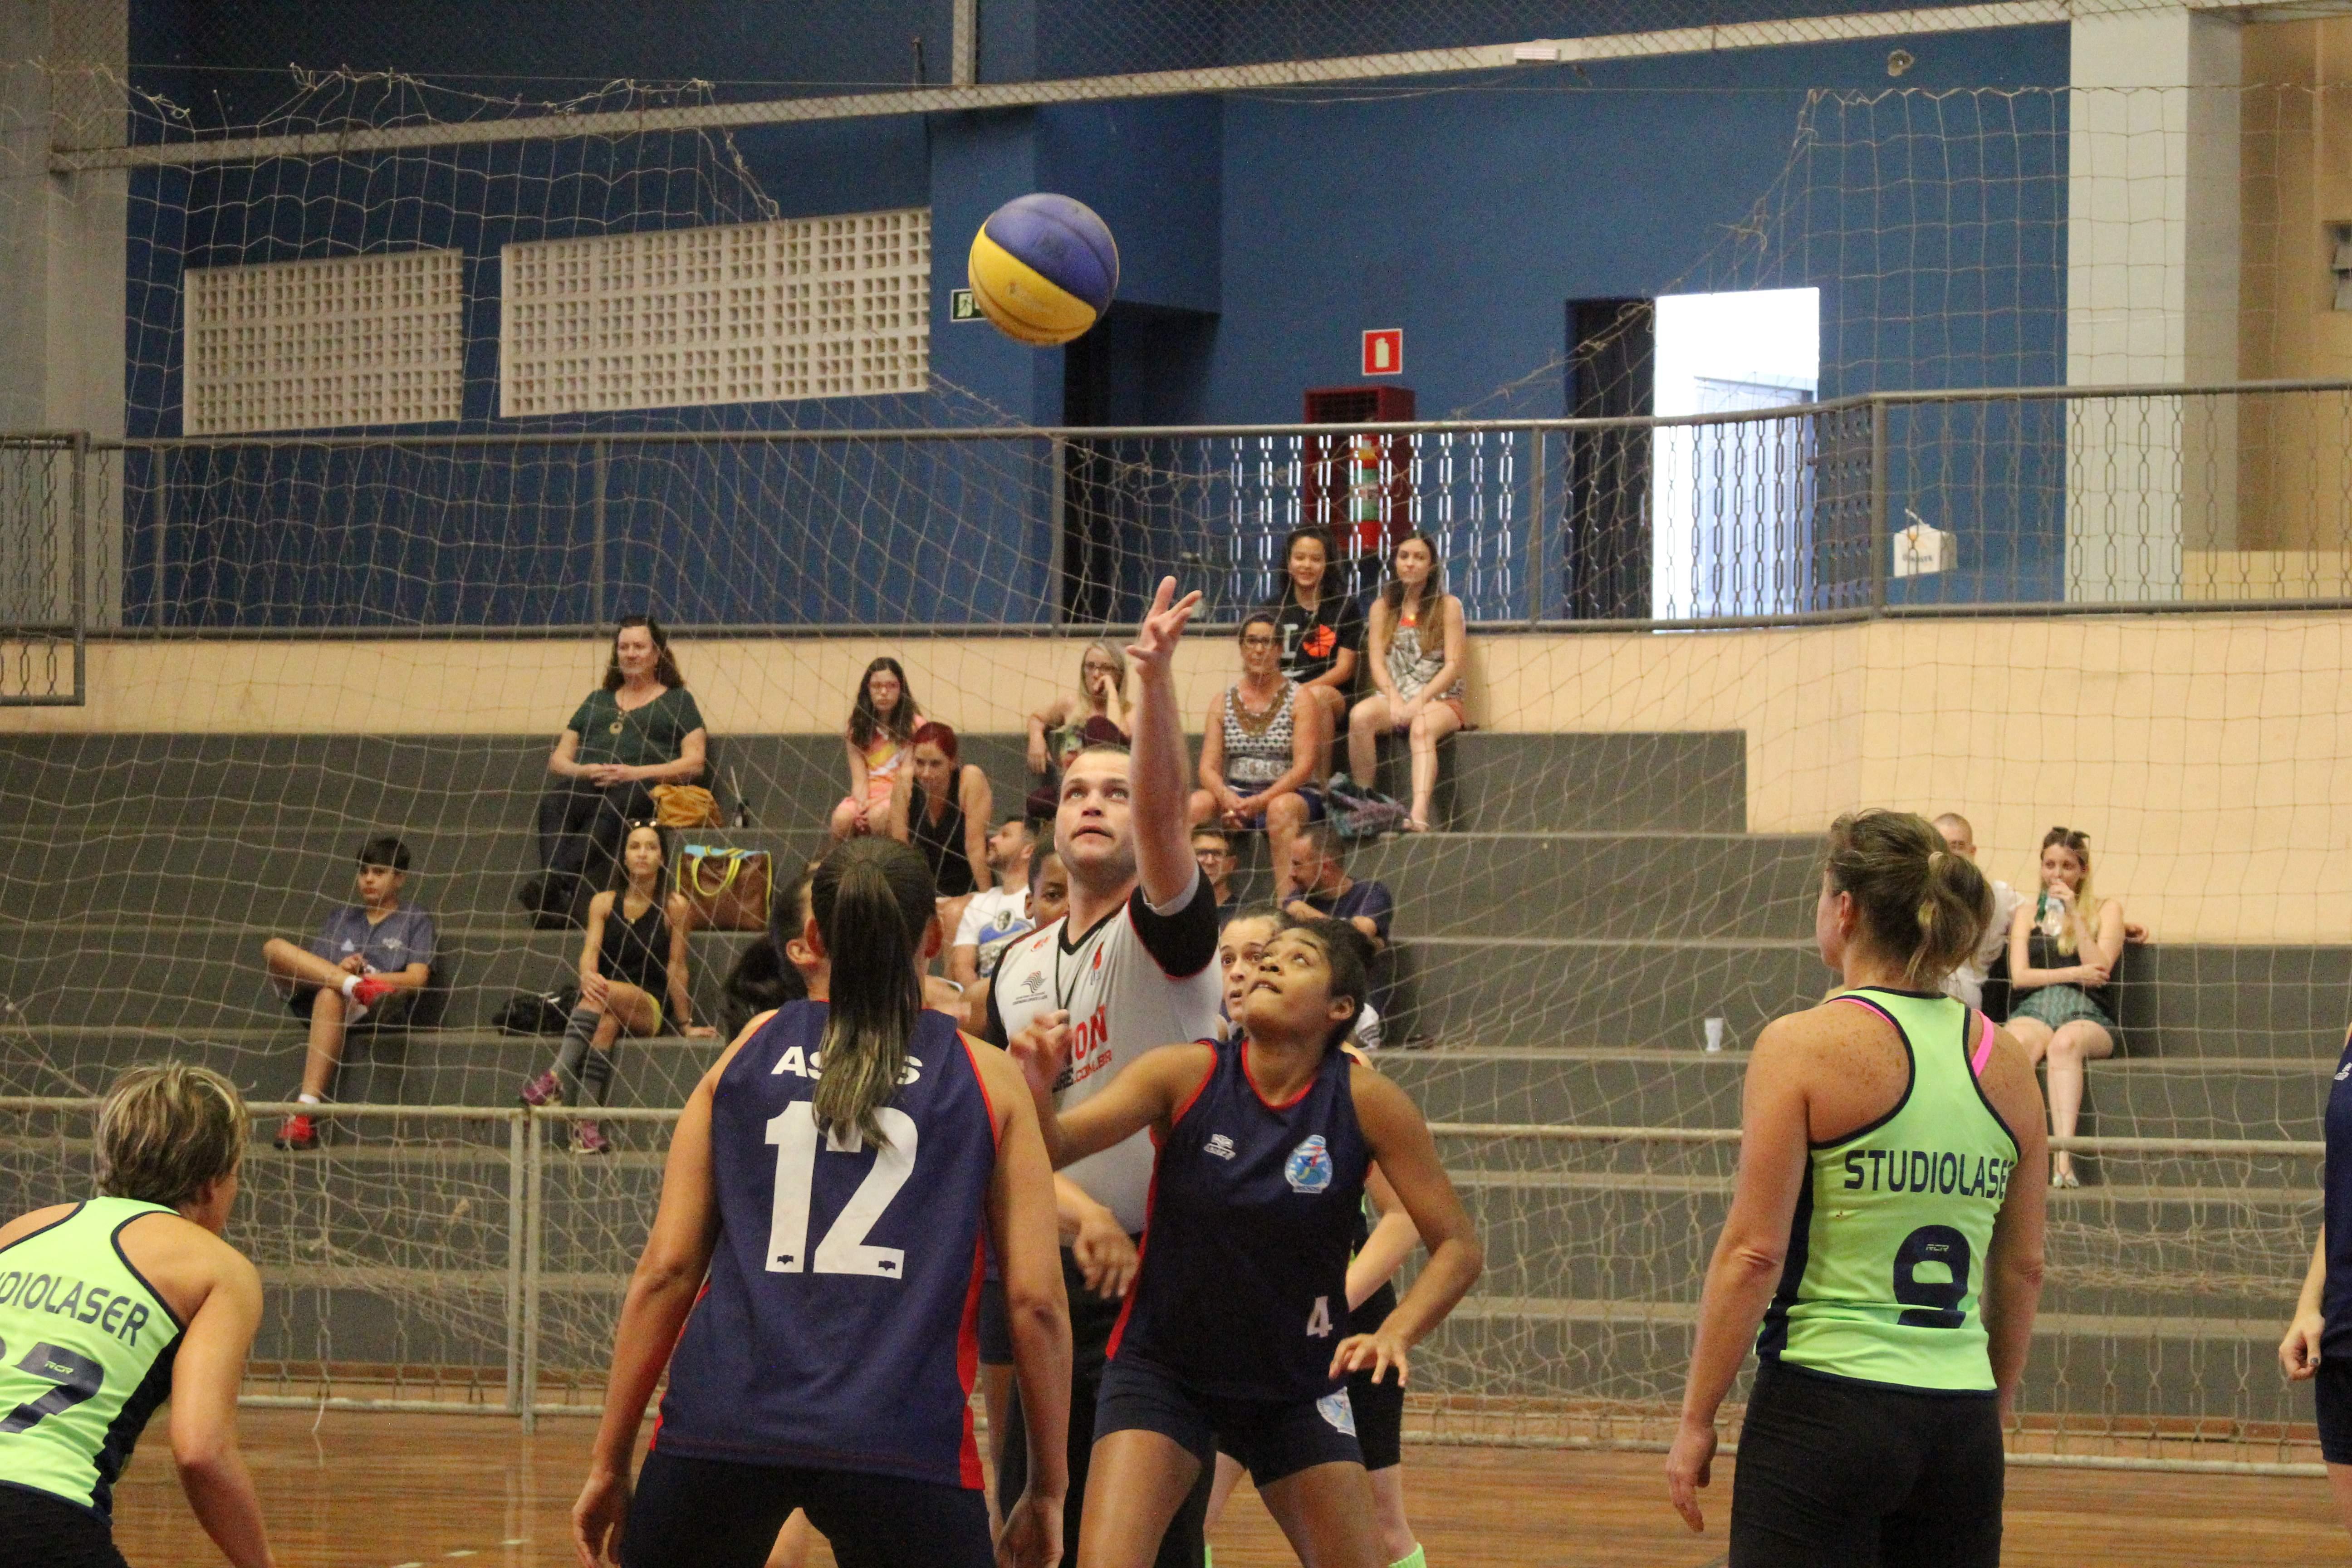 Equipe feminina de basquete joga partida pela LBC